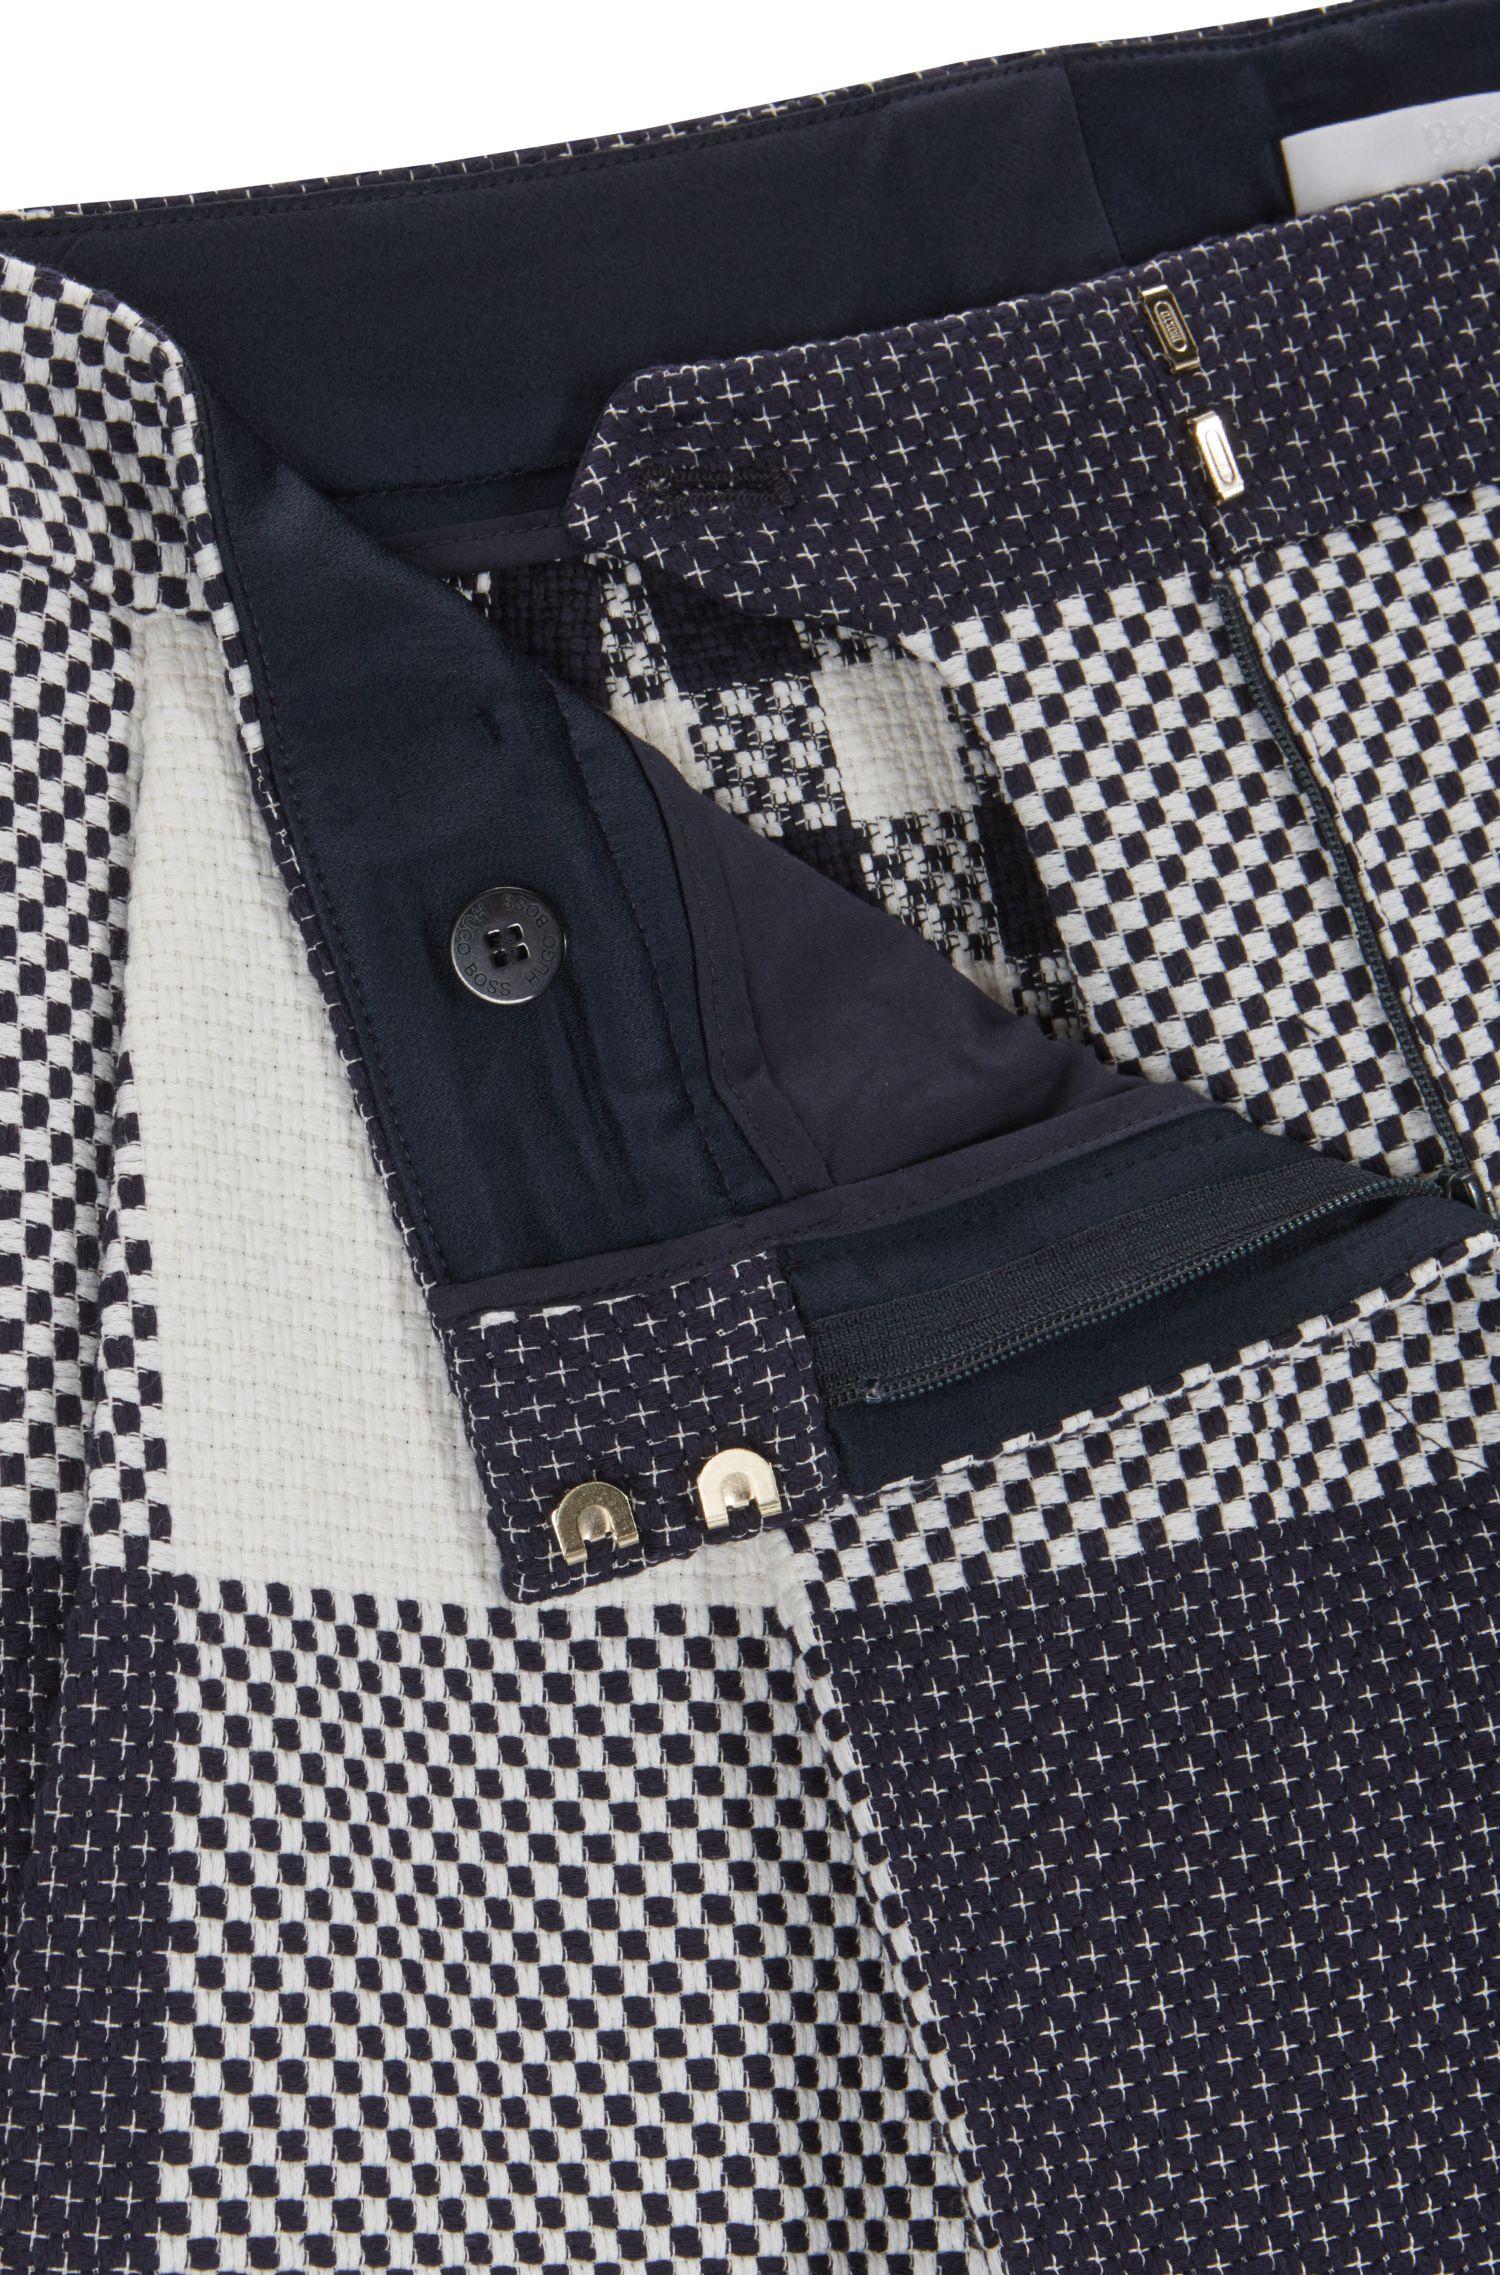 Cotton Wide Leg Pant | FS Tefia, Patterned